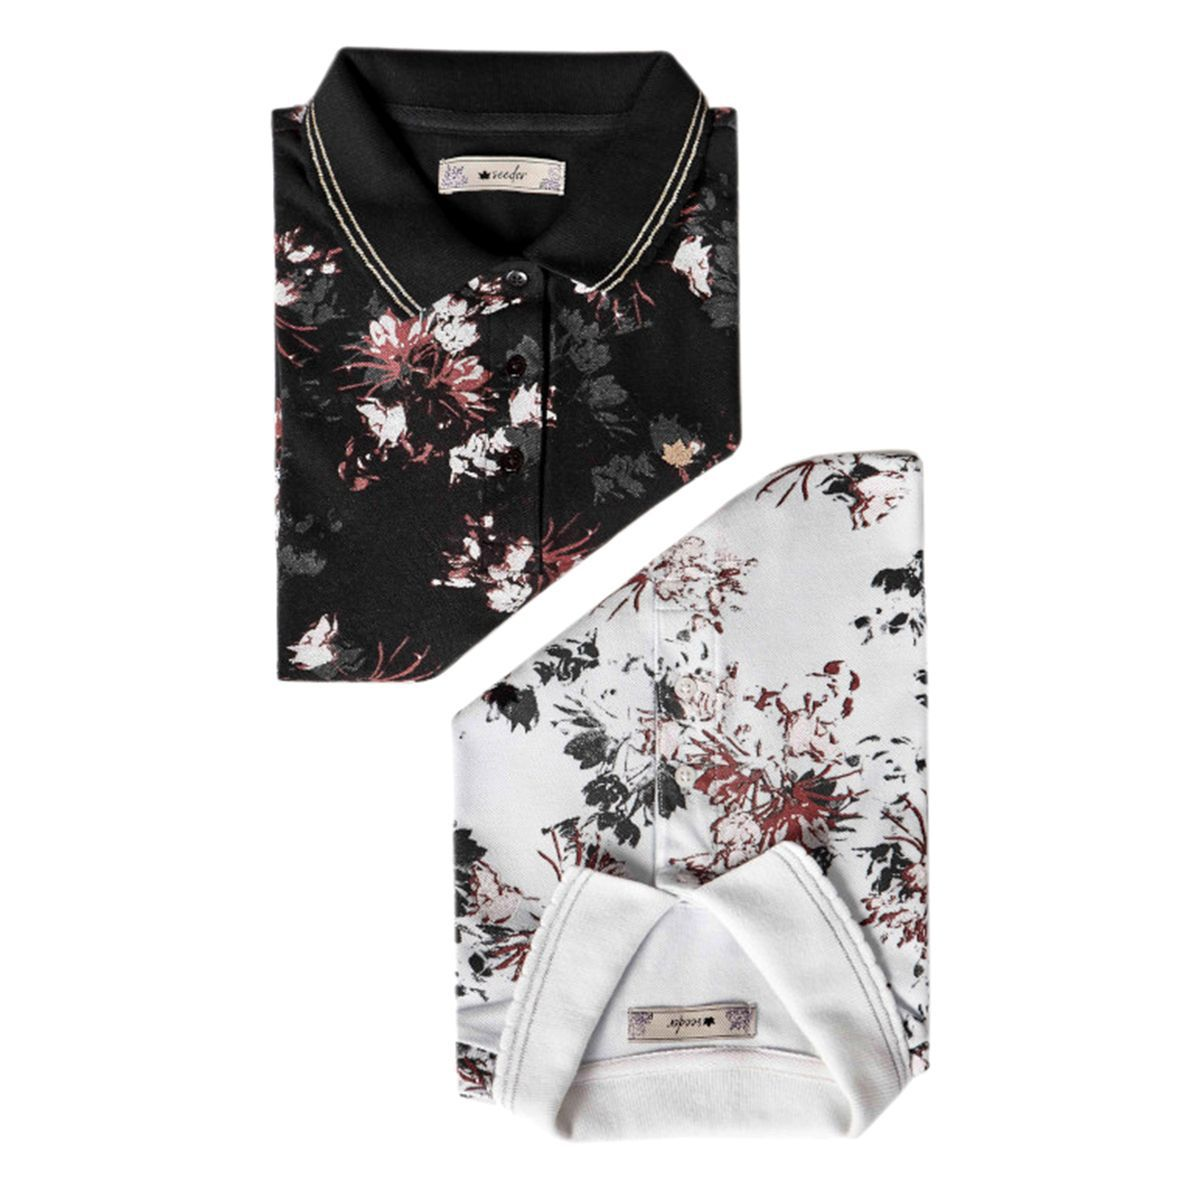 Camisa Polo Seeder Feminina Floral Preta